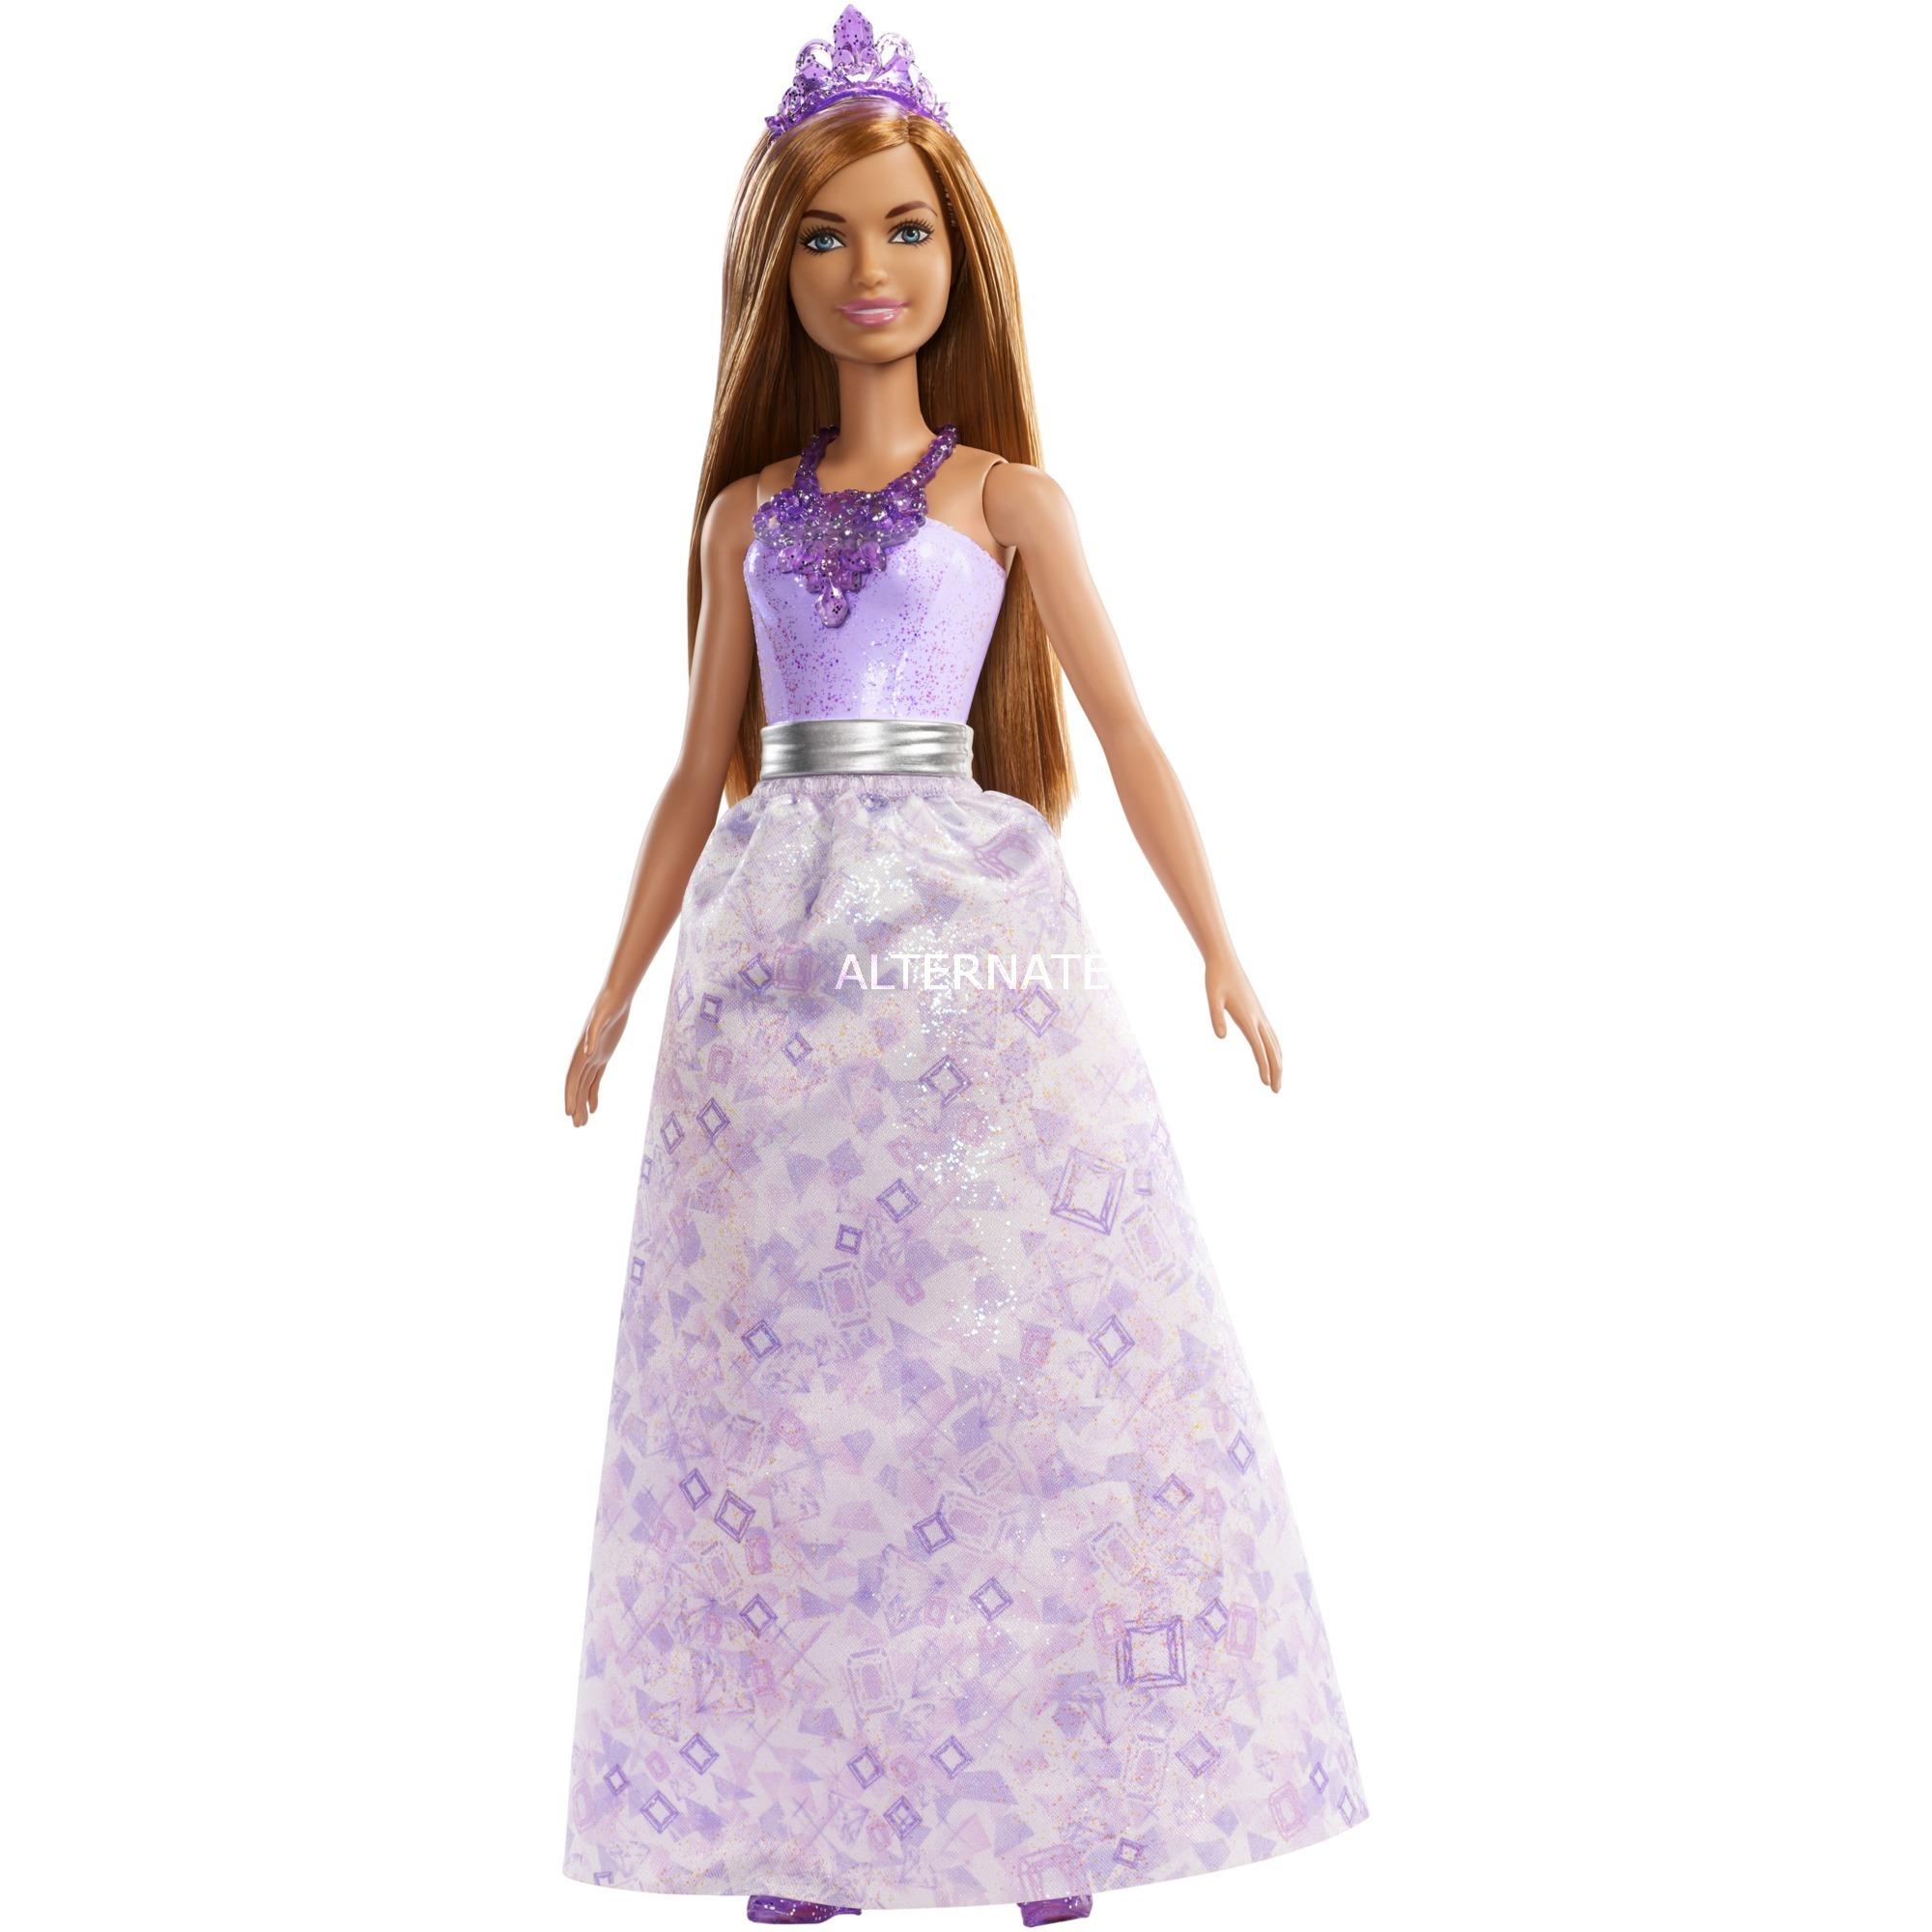 Barbie - Muñeca Pelo Castaño Claro - Princesa Dreamtopia